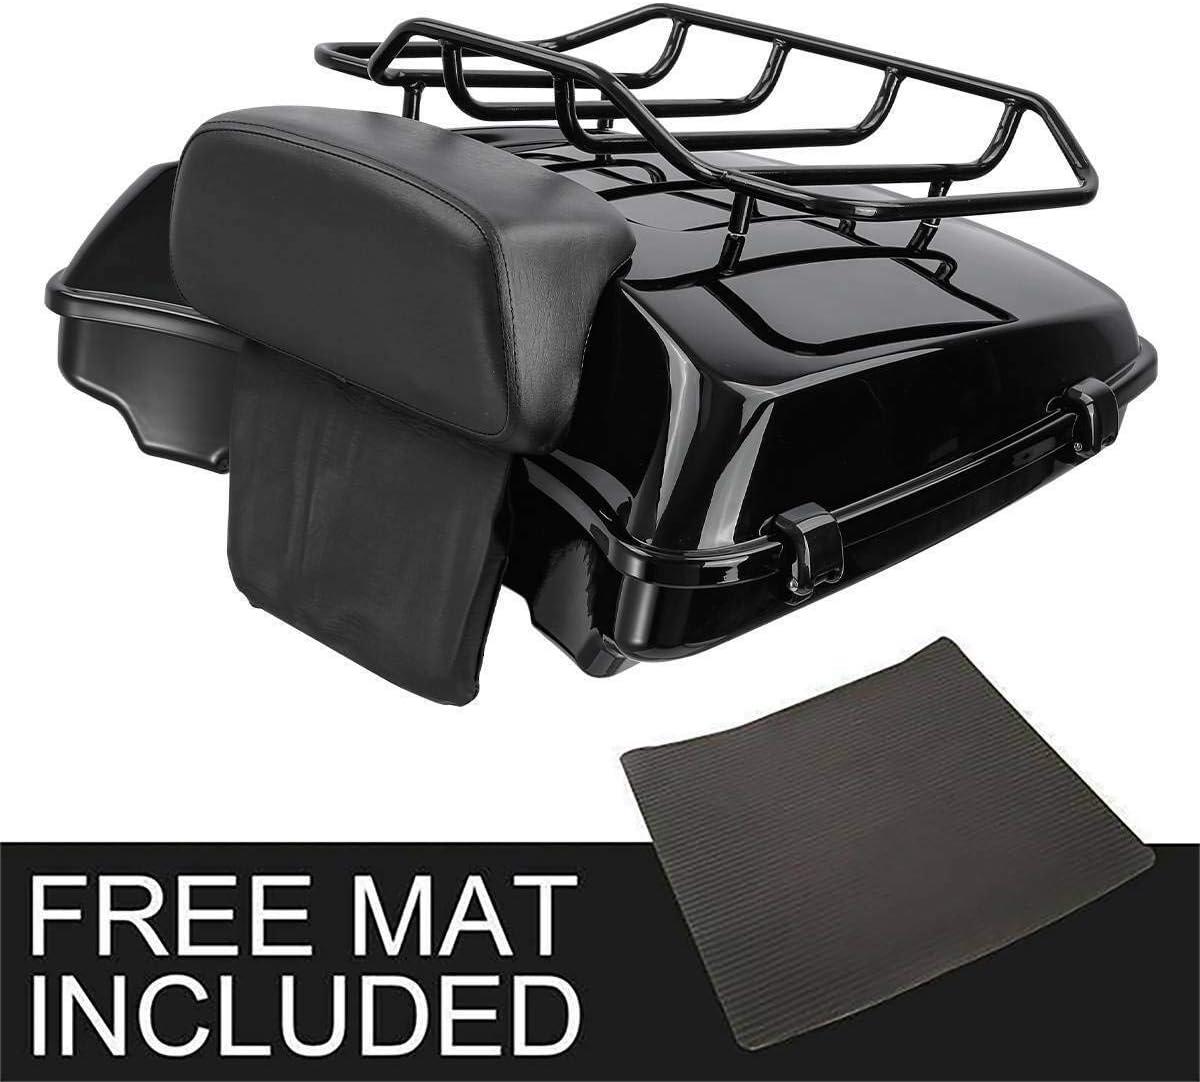 TCMT Vivid Black Razor Tour Pack Trunk Backrest Luggage Top Rack Rail Fit For Harley Touring Road Glide King Street Electra Glide14-20